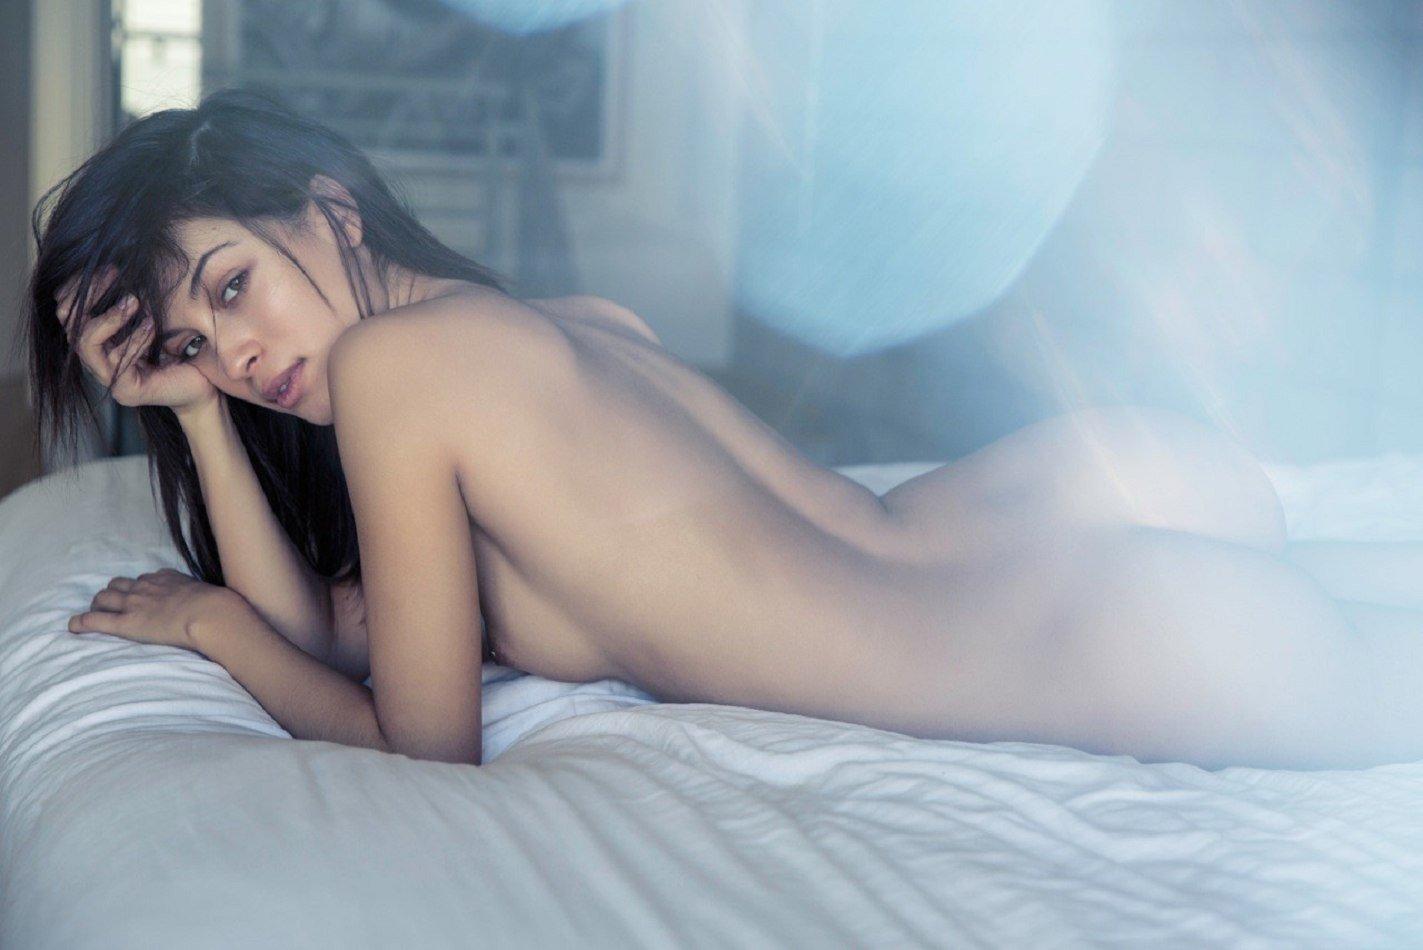 Litlle indian nude girl sex hard